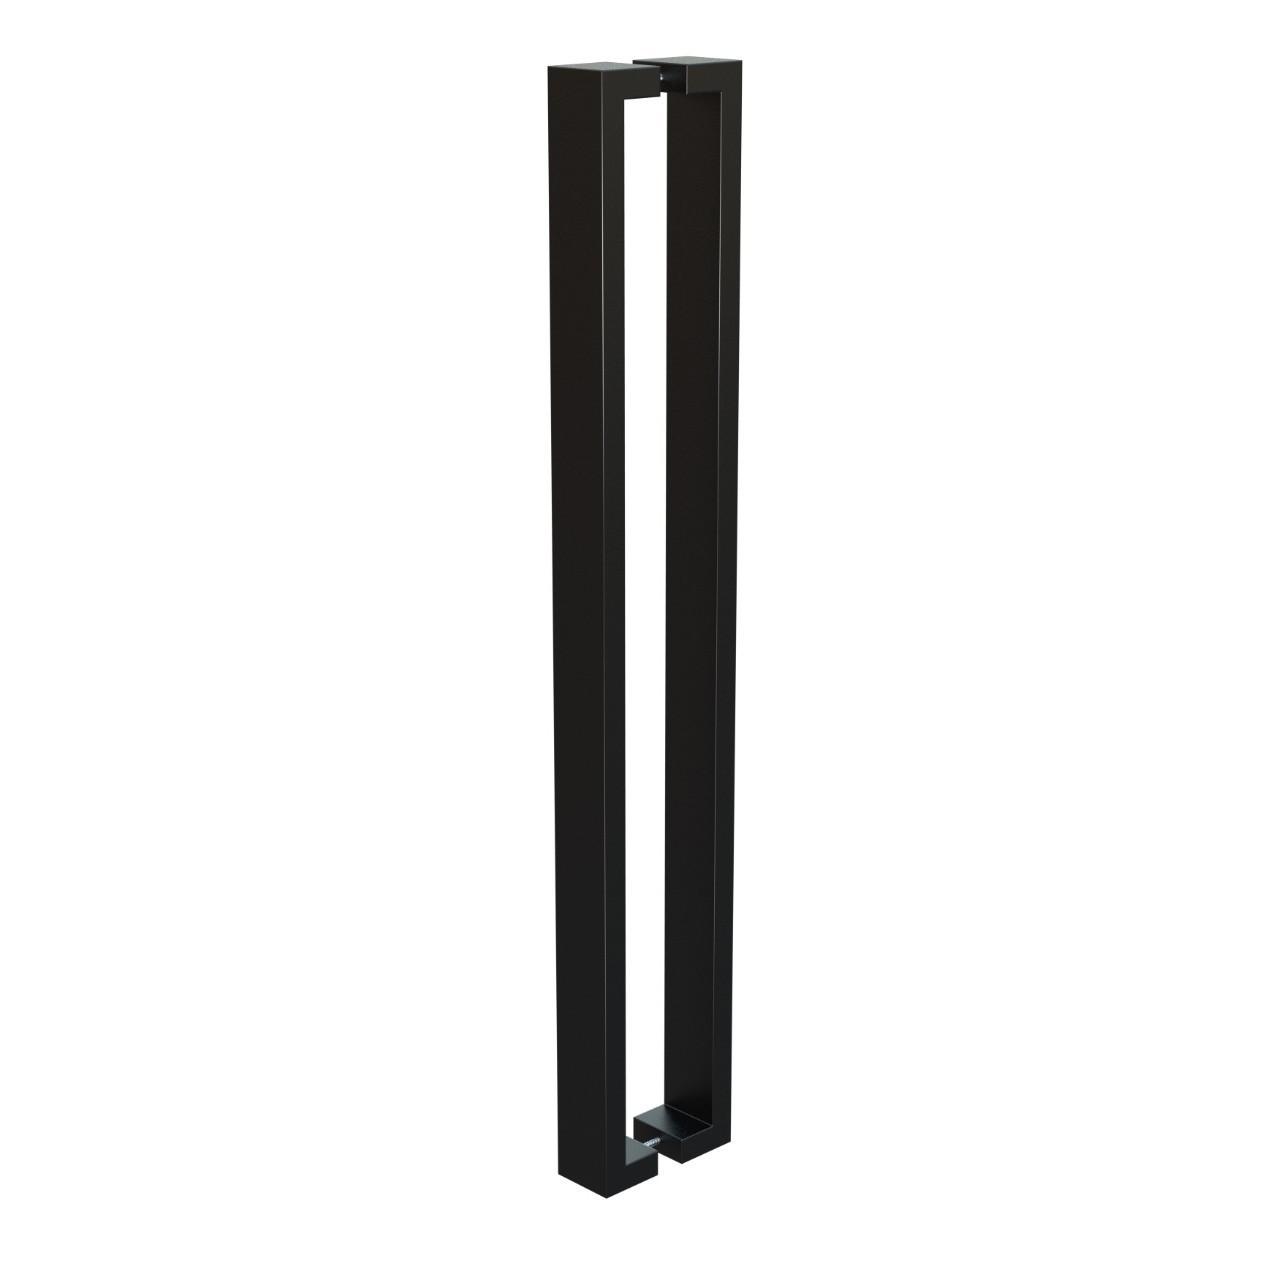 Puxador de Portas Sobrepor Aco Inox 121cm 1 par Leblon - Acobrasil